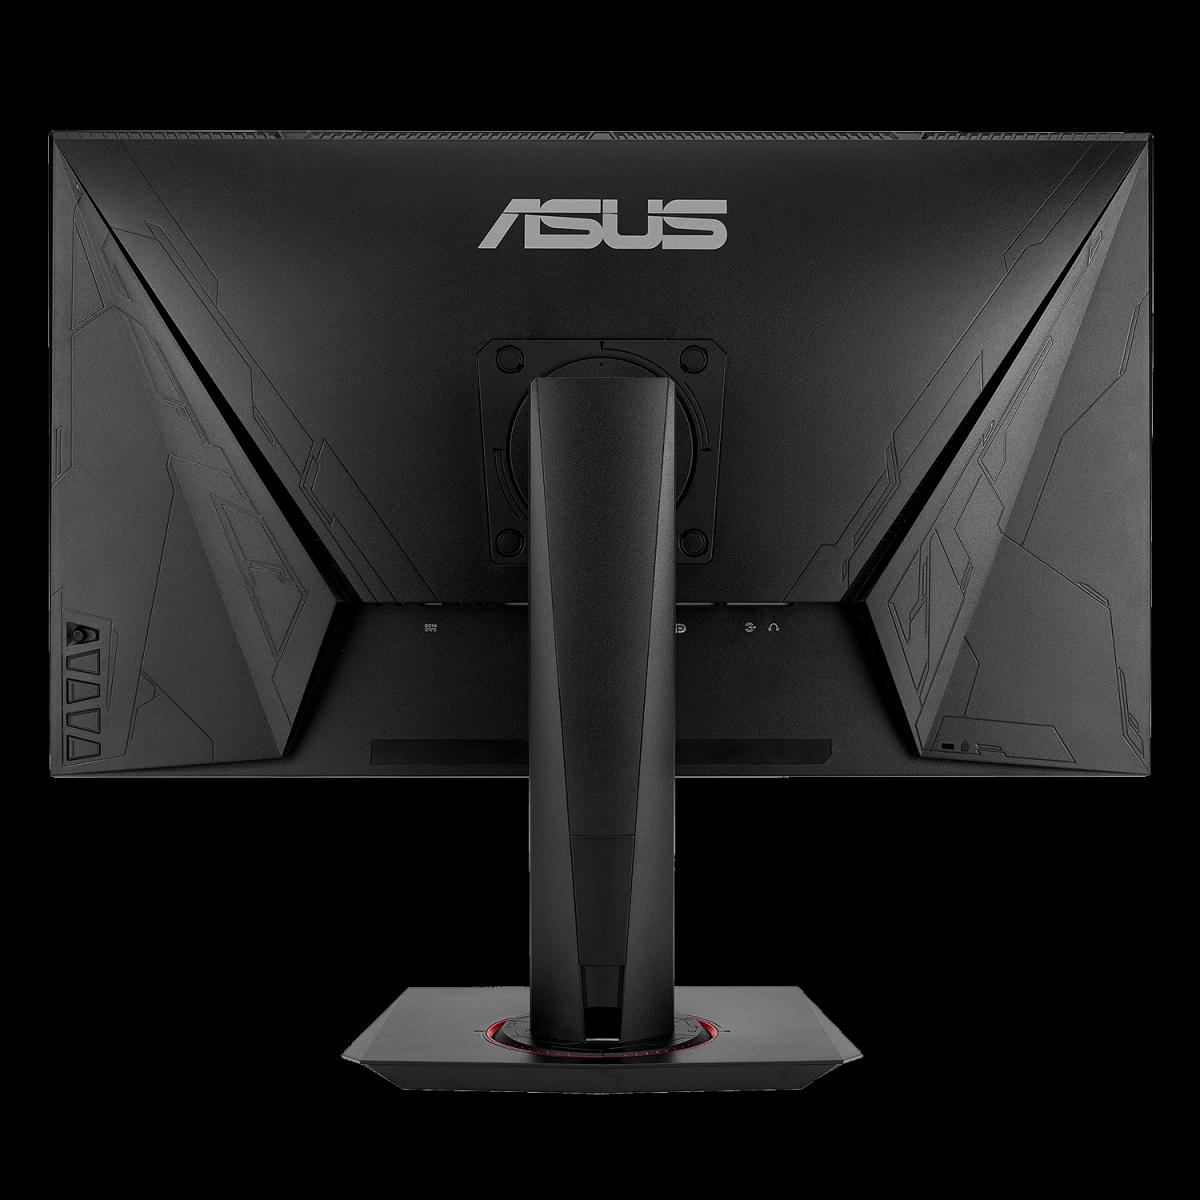 Monitor Gamer ASUS 27 Pol, Full HD, 1ms, IPS, 144Hz, HDMI/DP/DVI, VG279Q